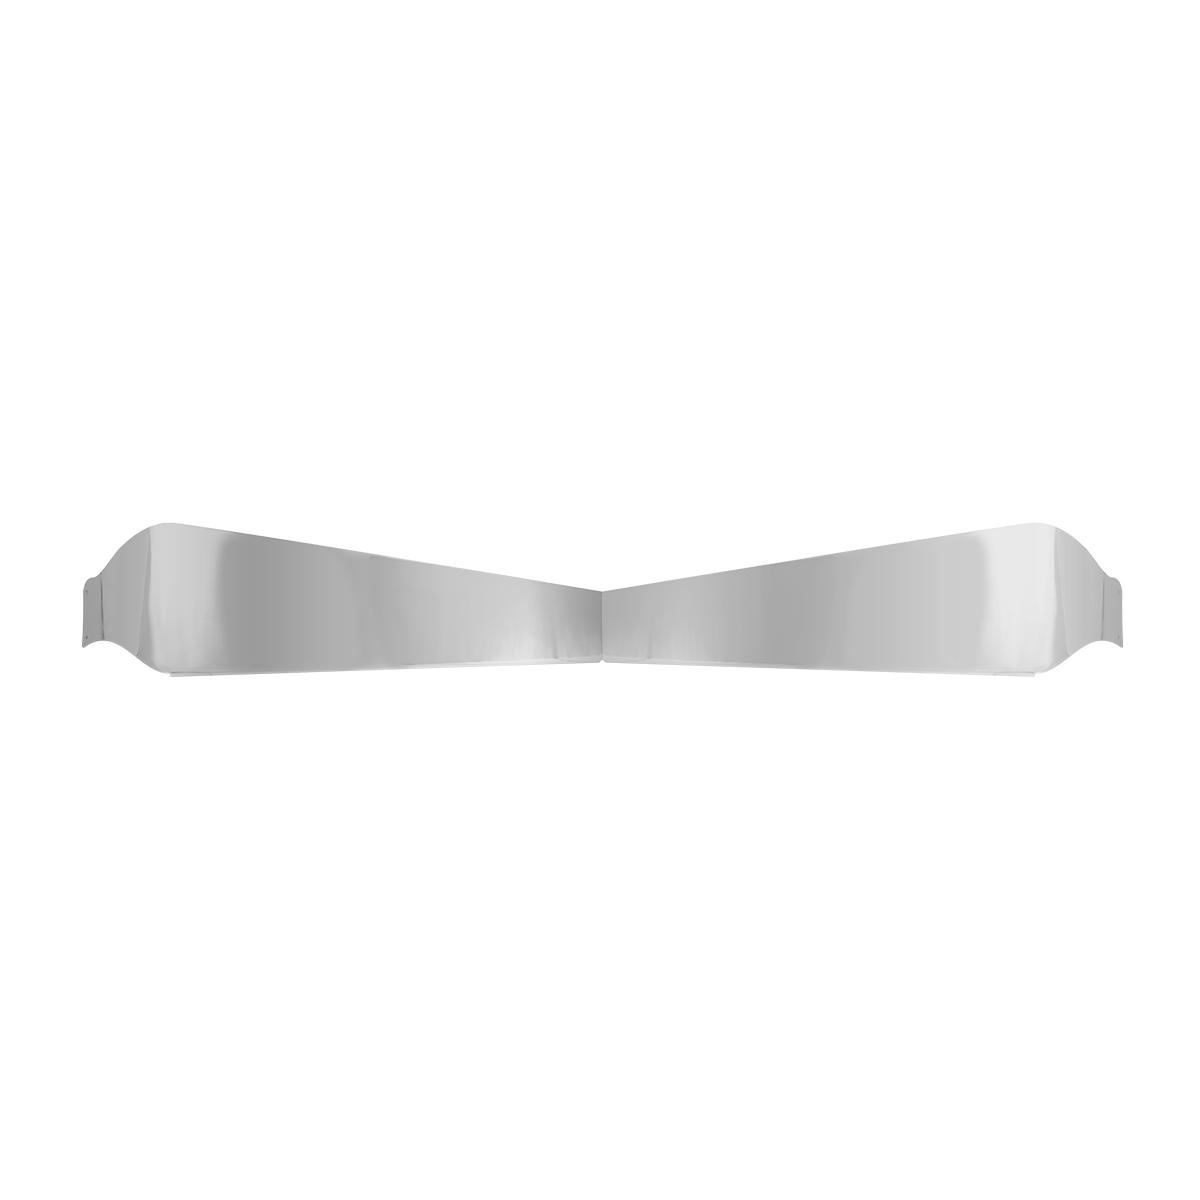 96900 Pete Stainless Steel Sun Visor